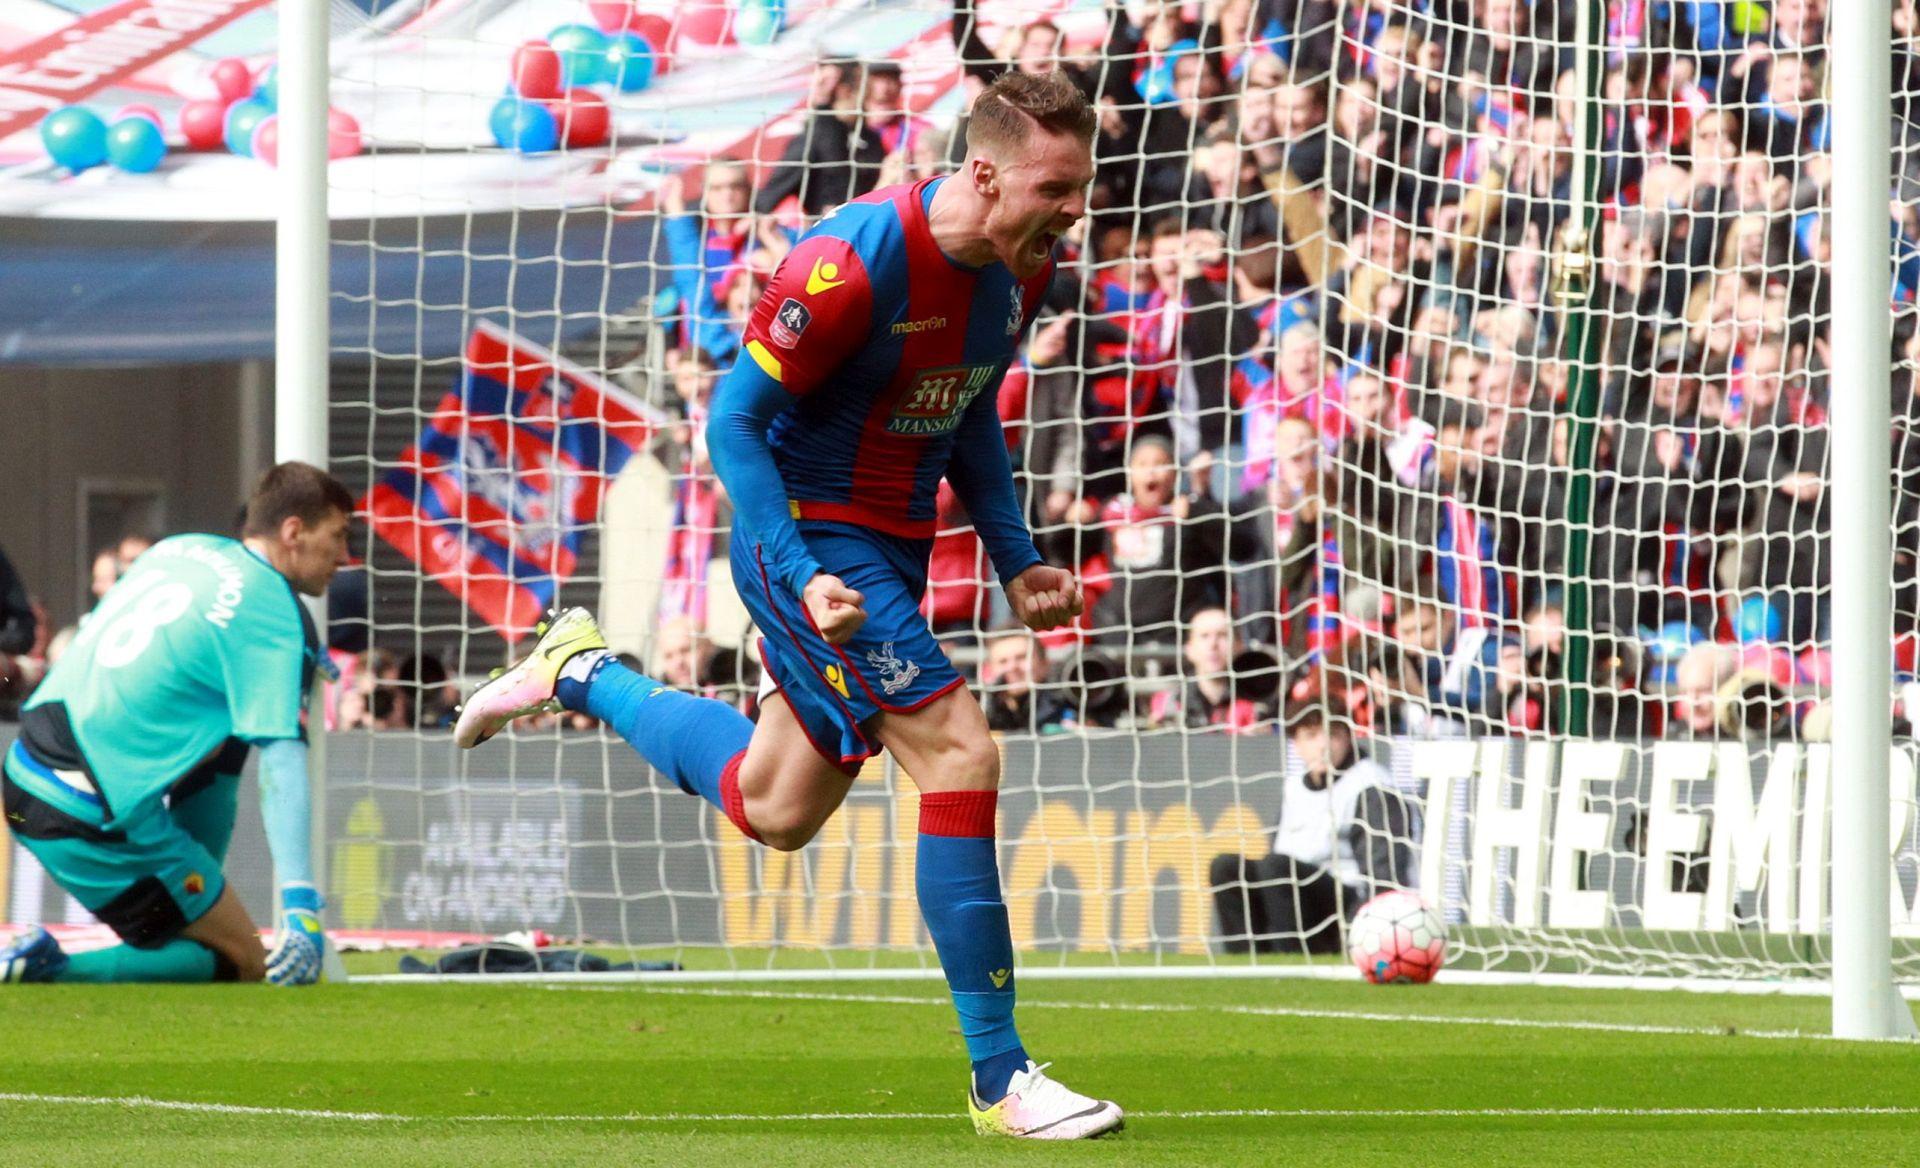 FA KUP Crystal Palace izborio finale s Manchester Unitedom